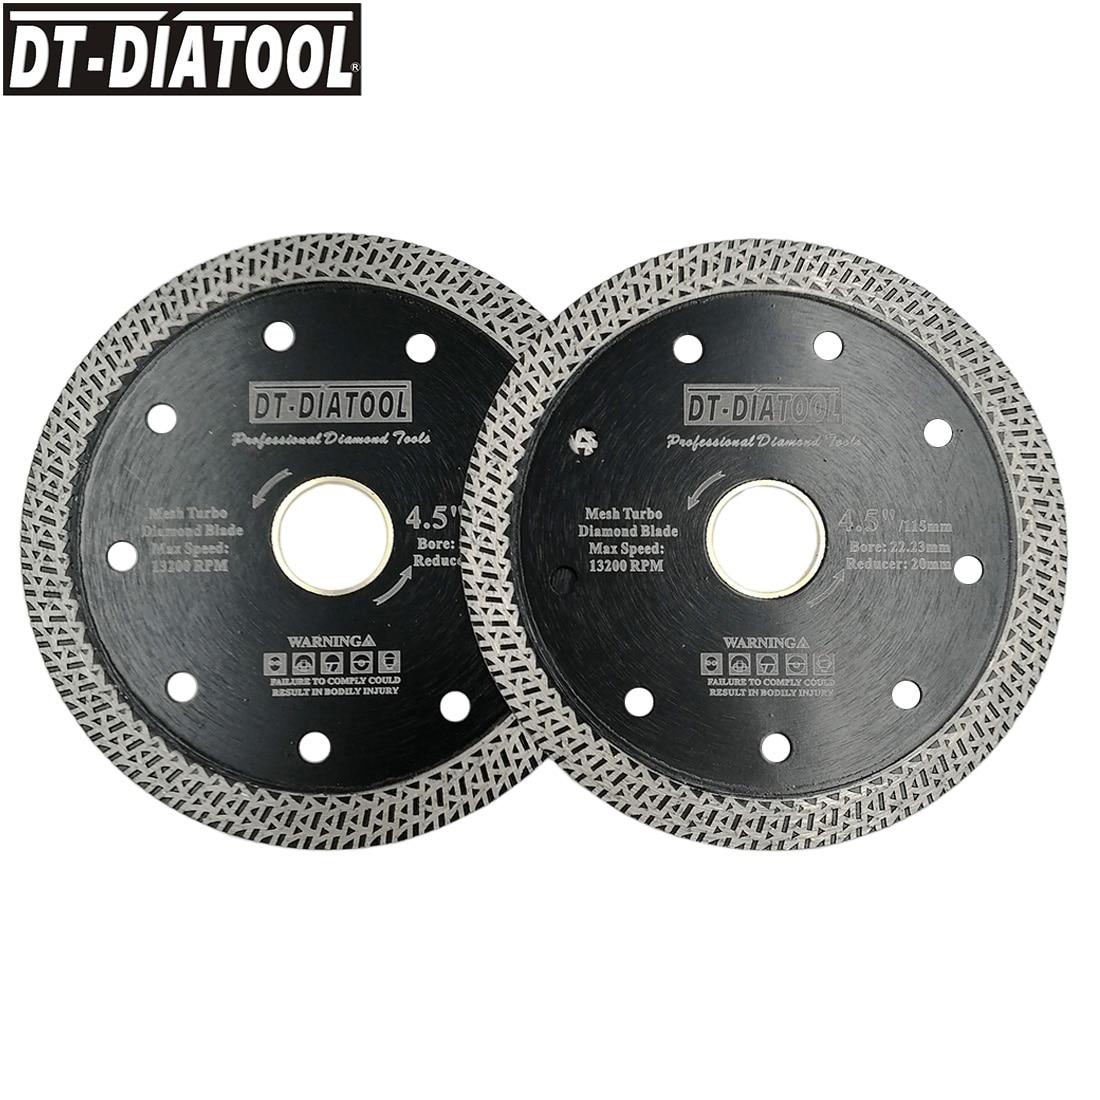 DT-DIATOOL 2pcs Diameter 115mm/4.5